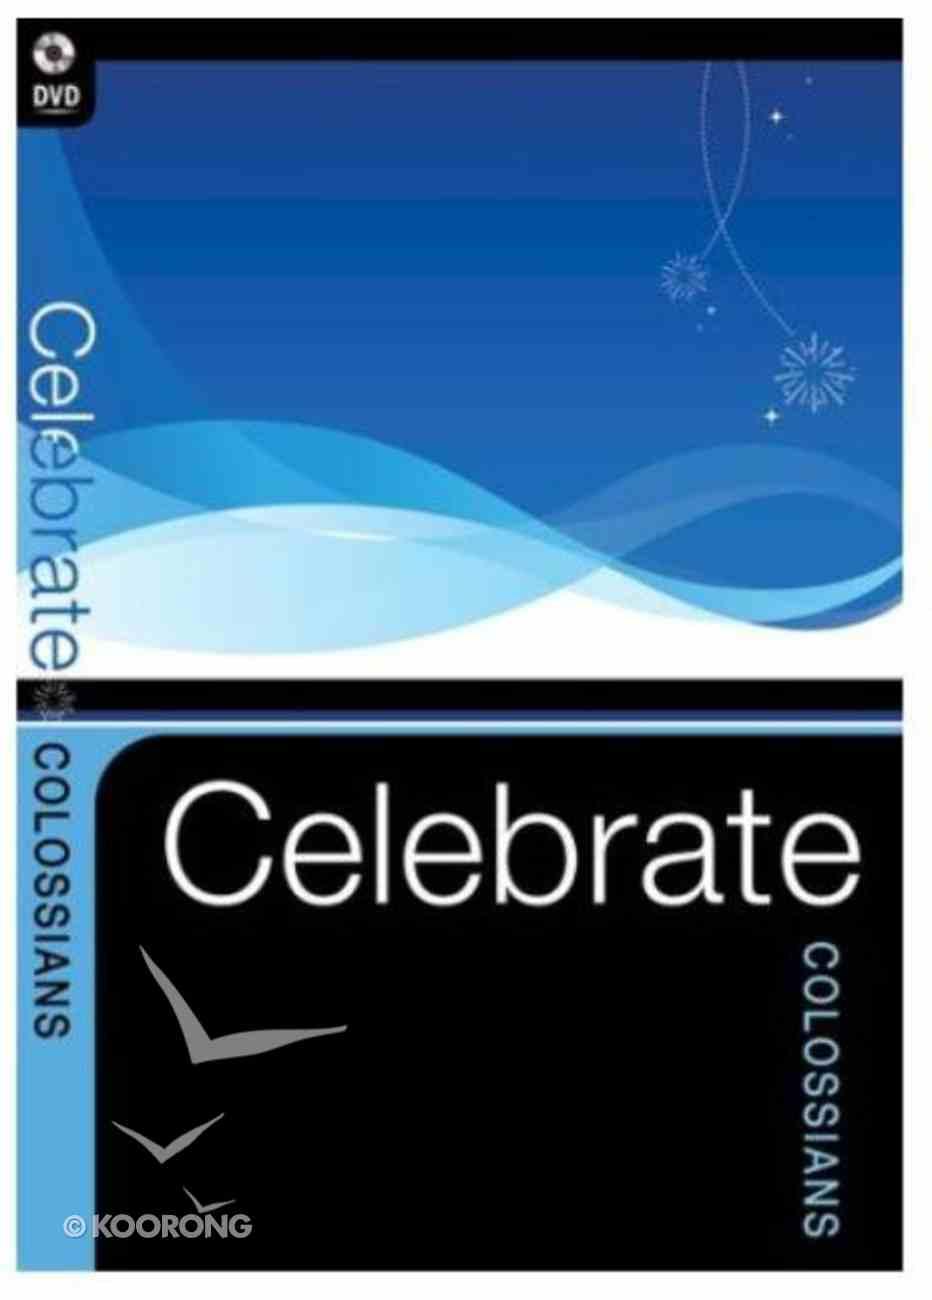 Colossians Bible Study (Celebrate Bible Study Series) DVD